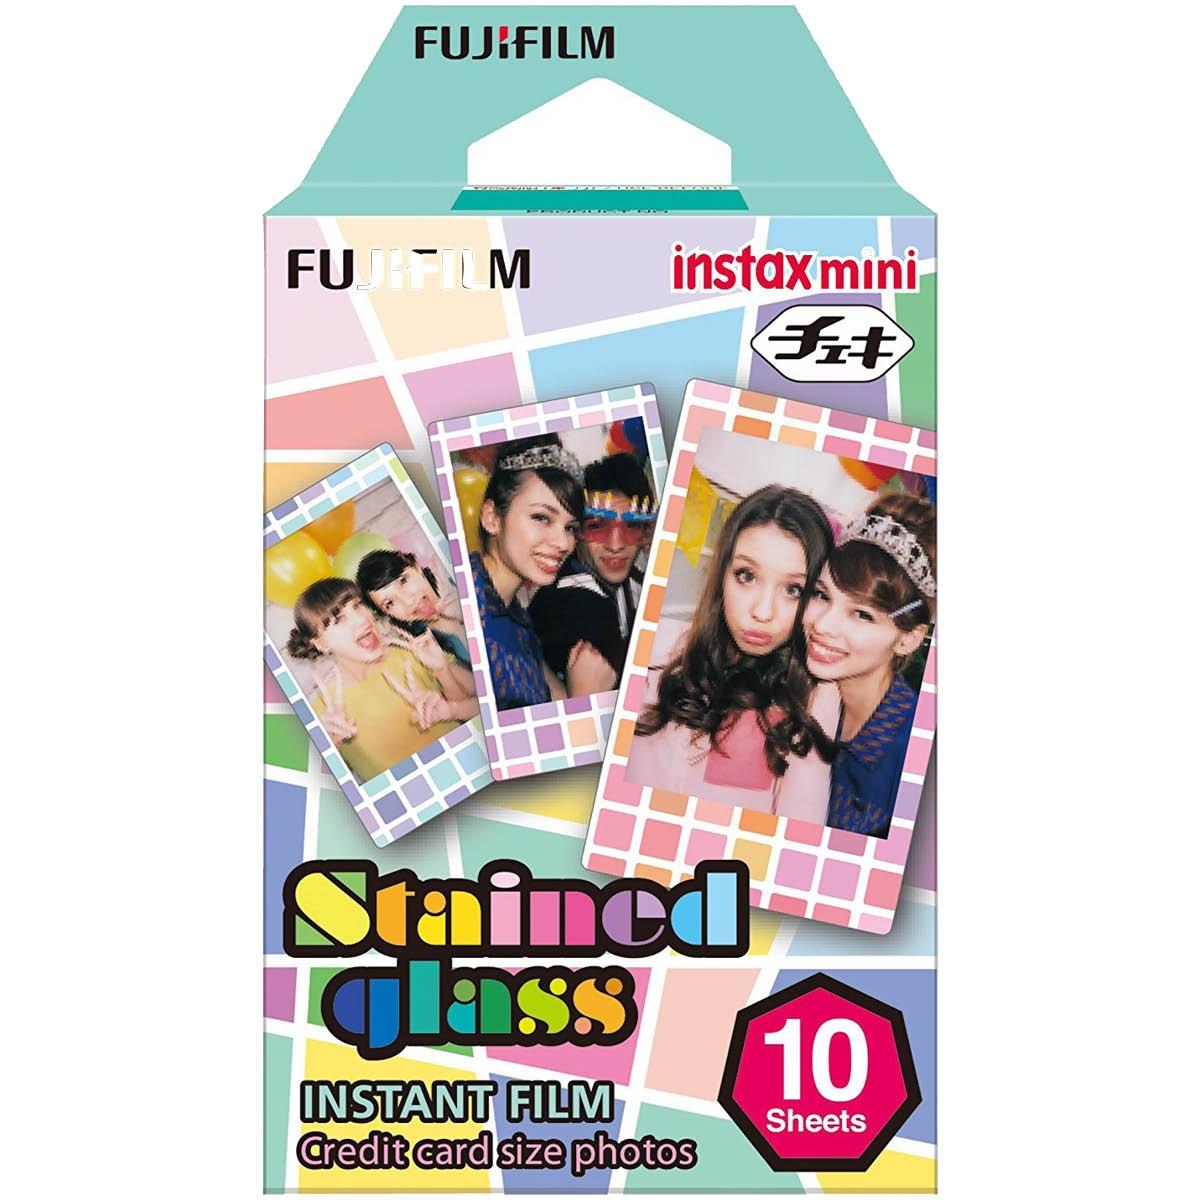 Fujifilm Instax Mini Stained Glass Film